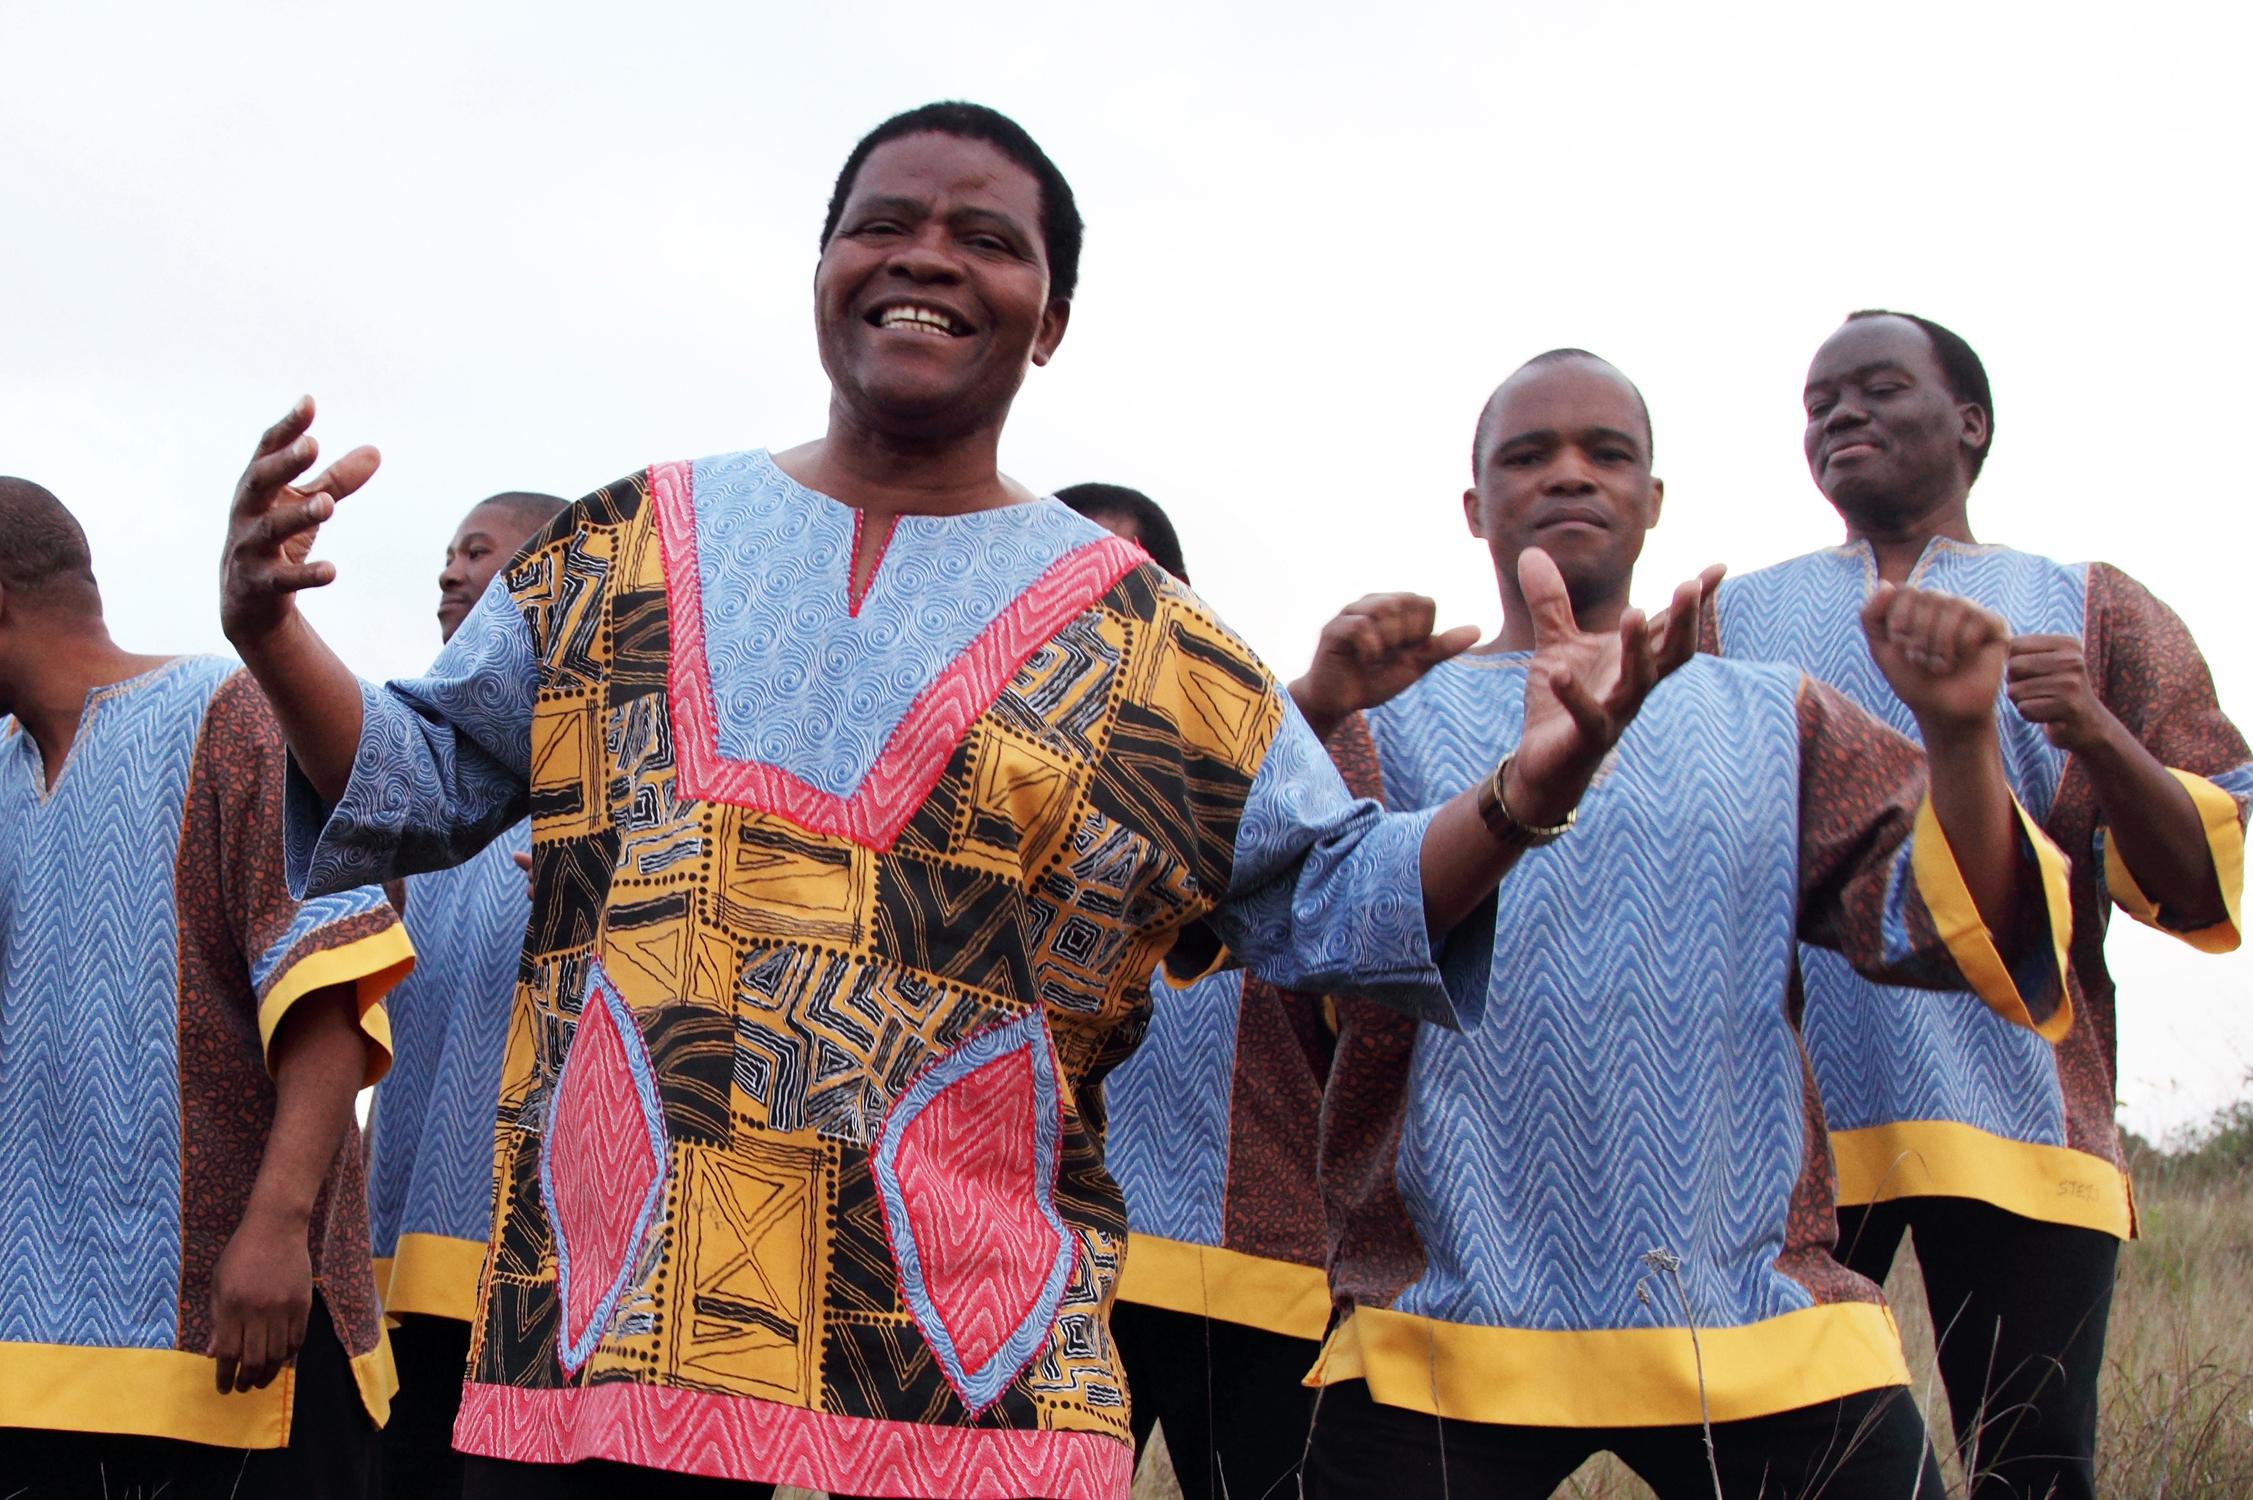 The Hallelujah Train + Ladysmith Black Mambazo